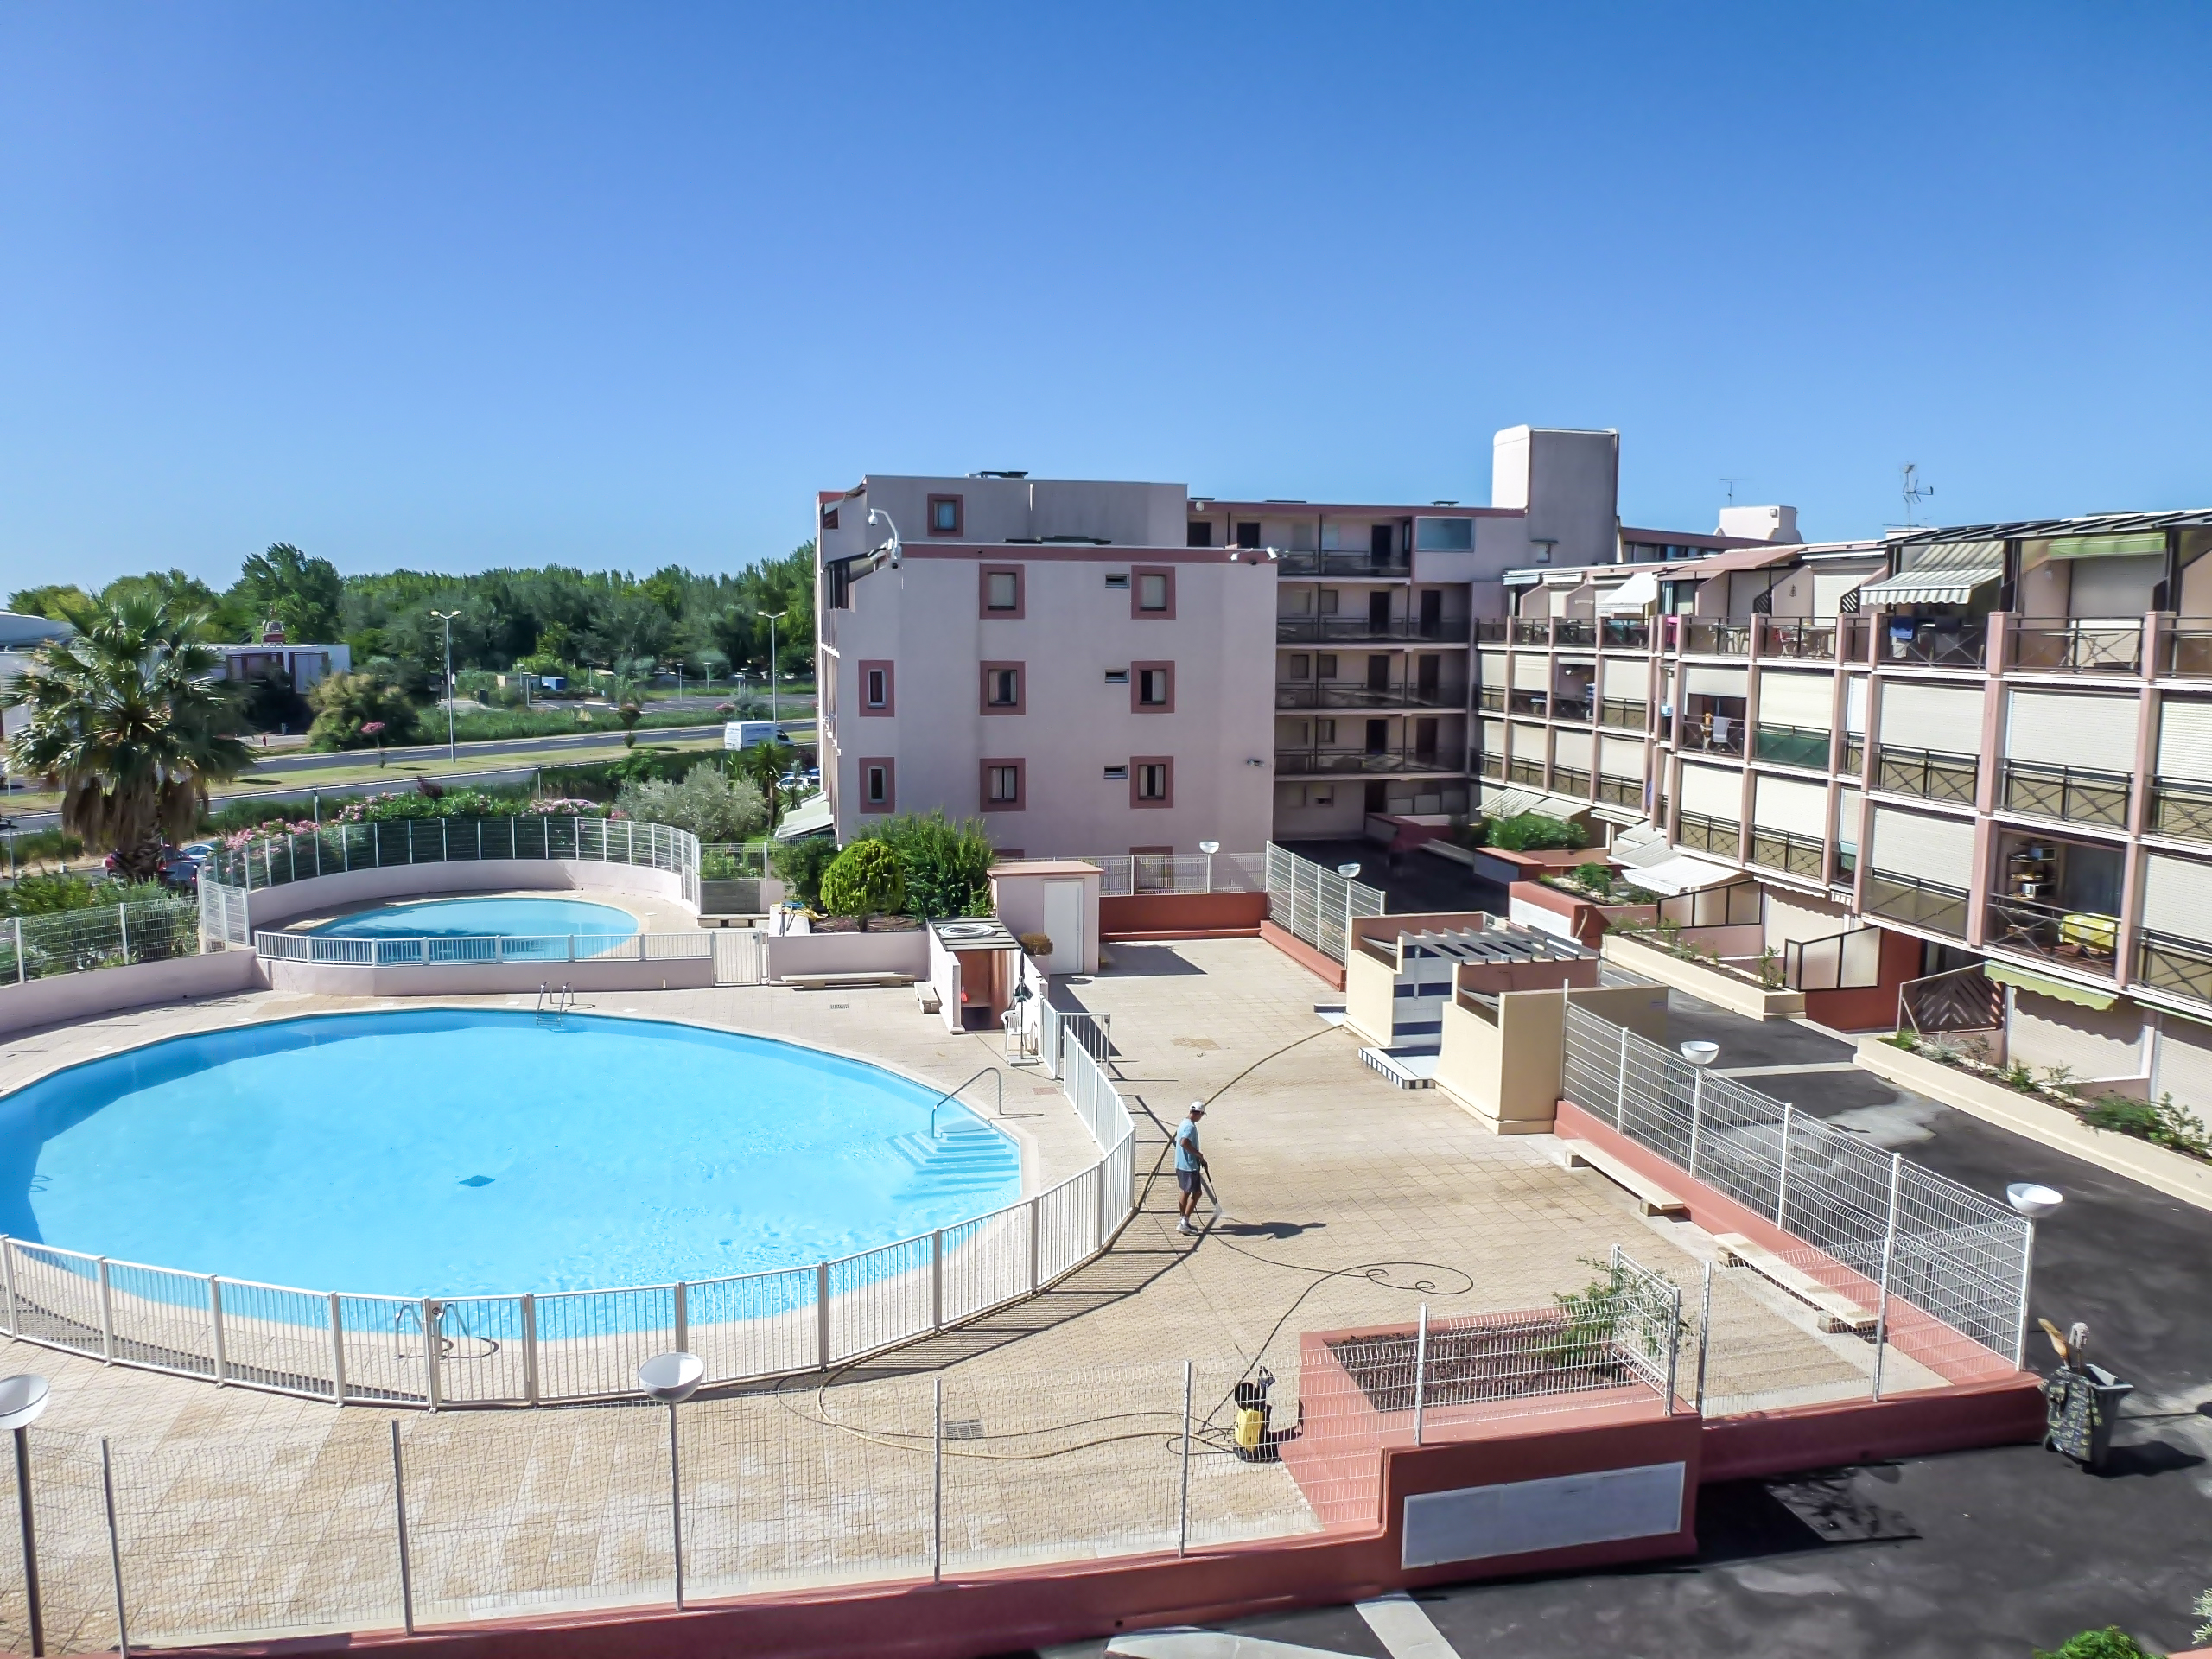 Location Appart Hotel Le Grau Du Roi